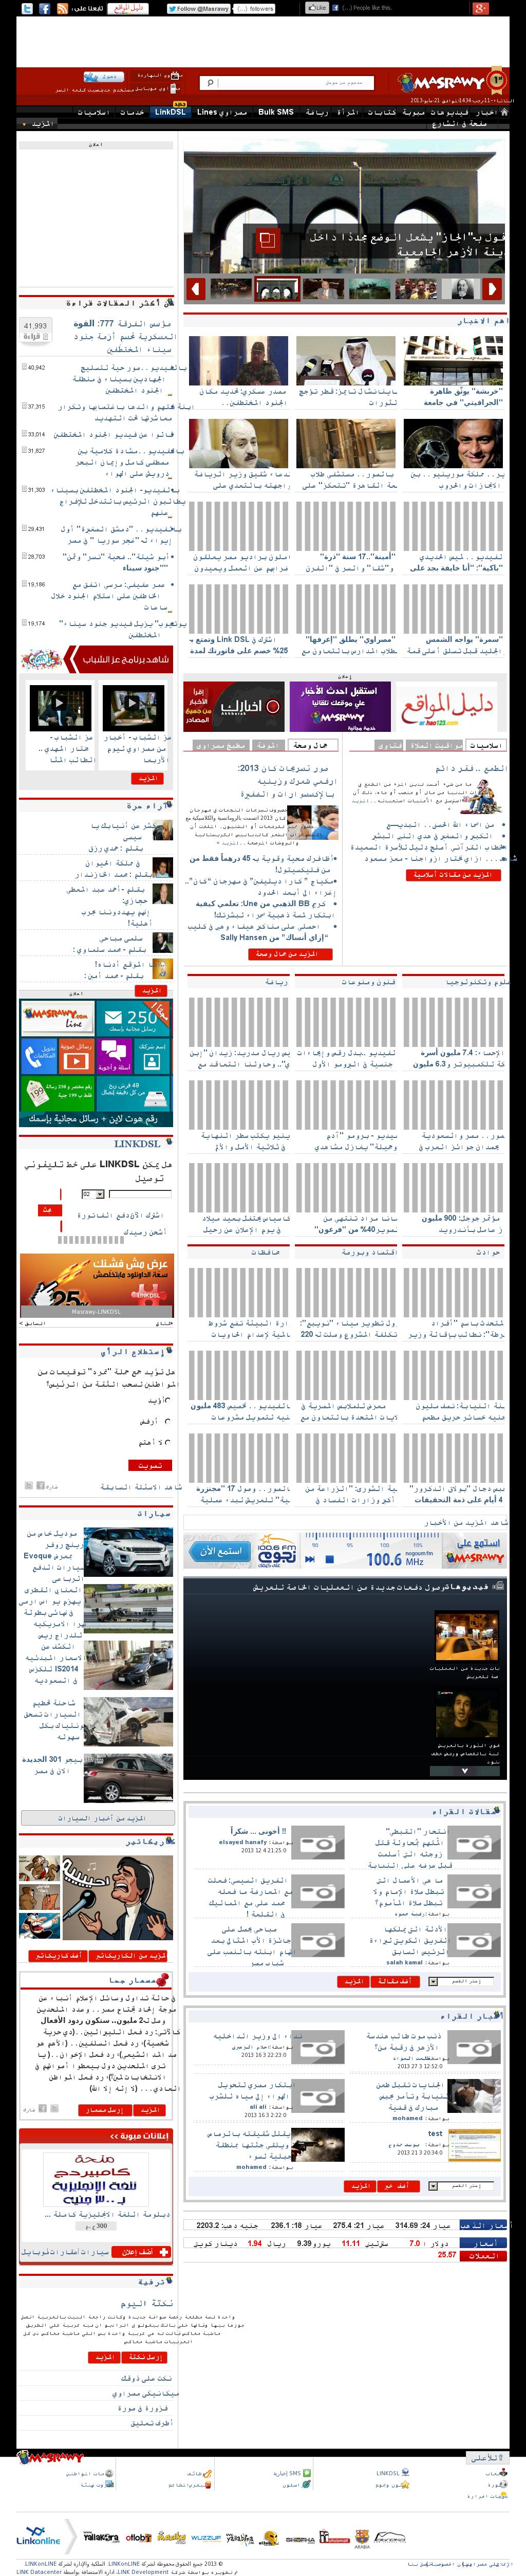 Masrawy at Monday May 20, 2013, 10:13 p.m. UTC